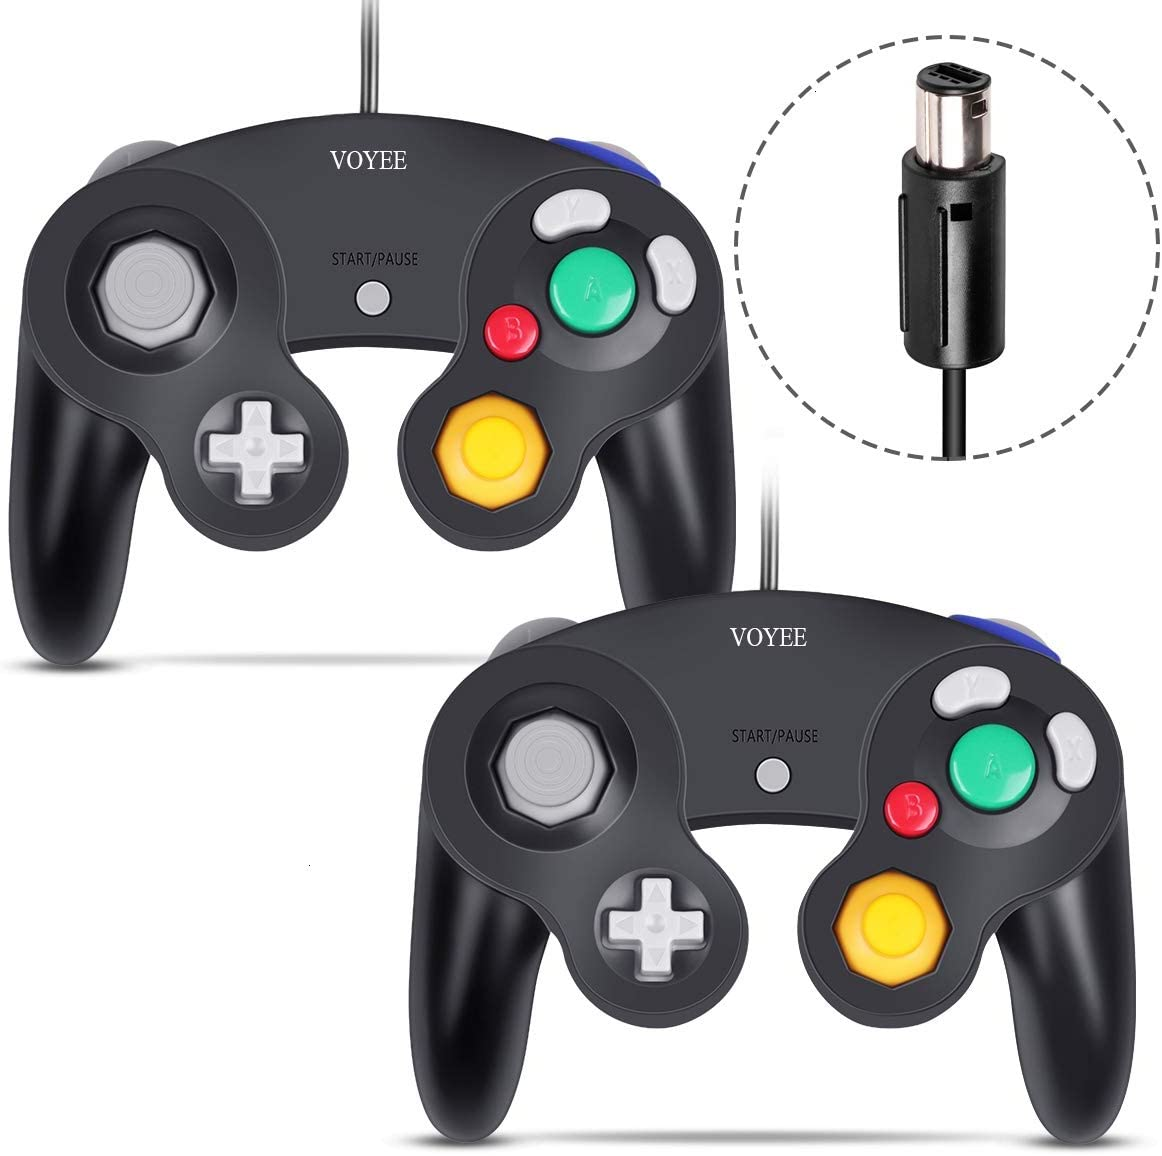 Accesorios para Consolas > Para Nintendo > <b>Otros</b>